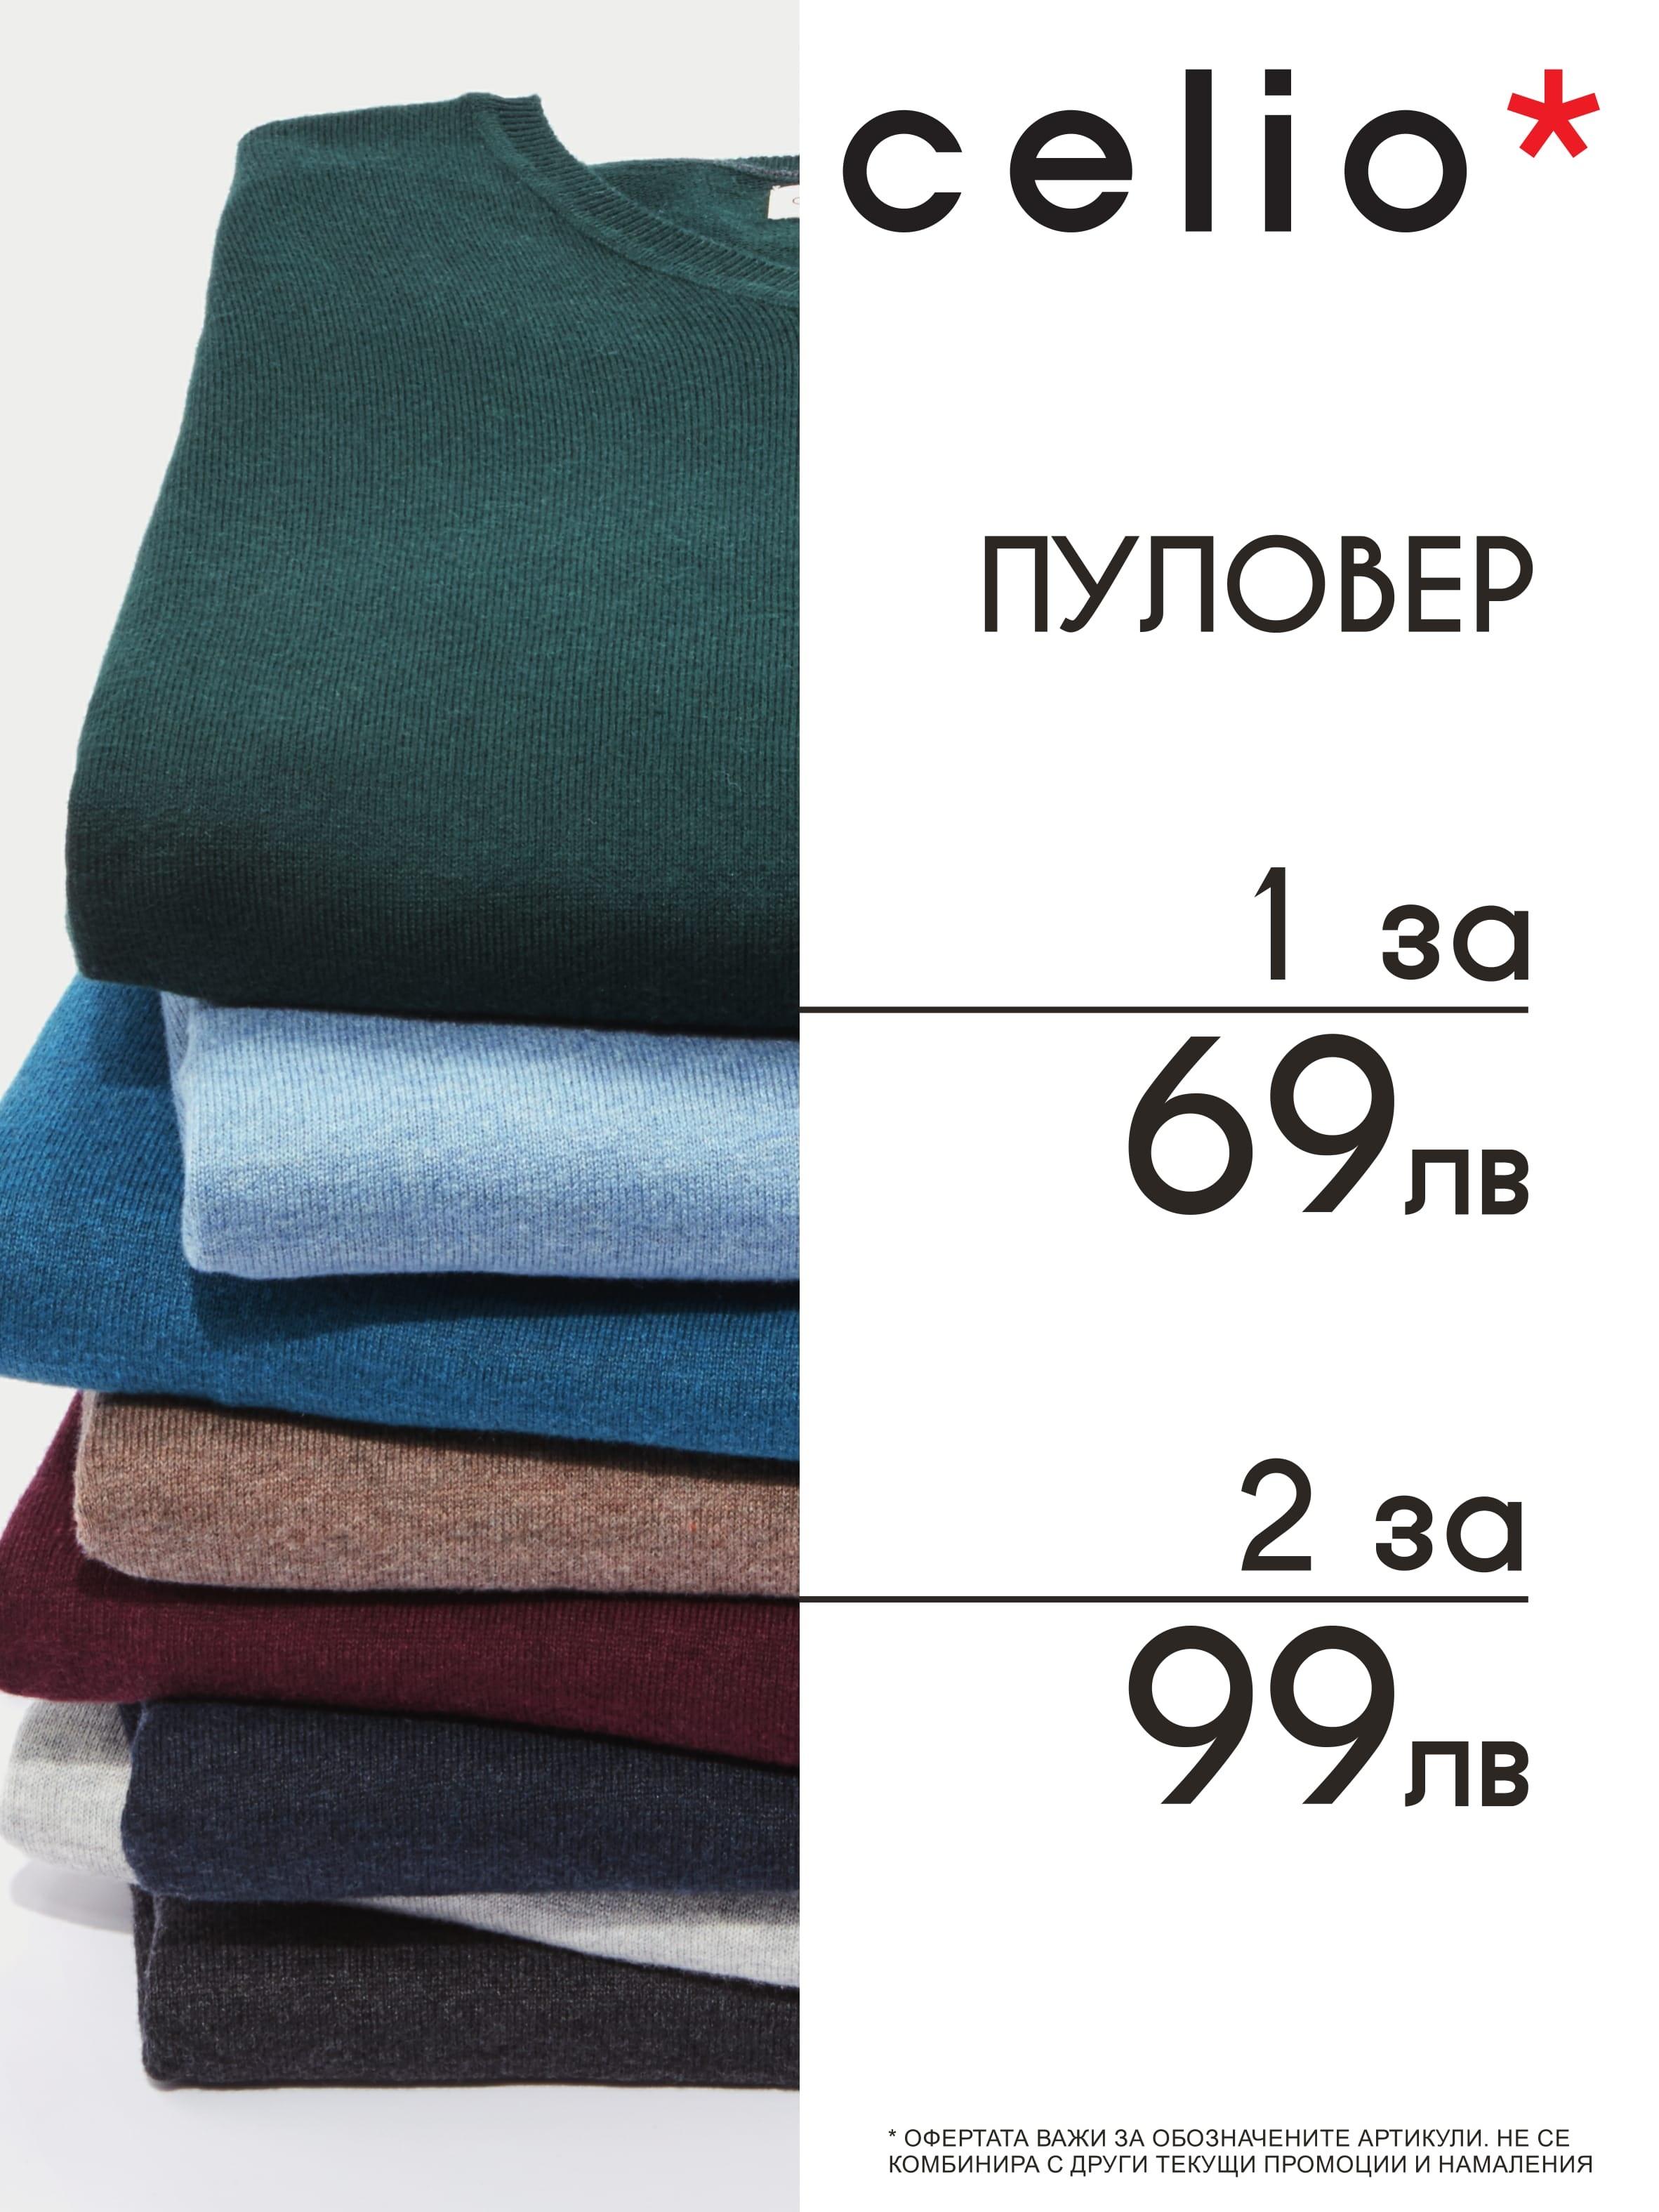 Celio* – пуловери на специални цени